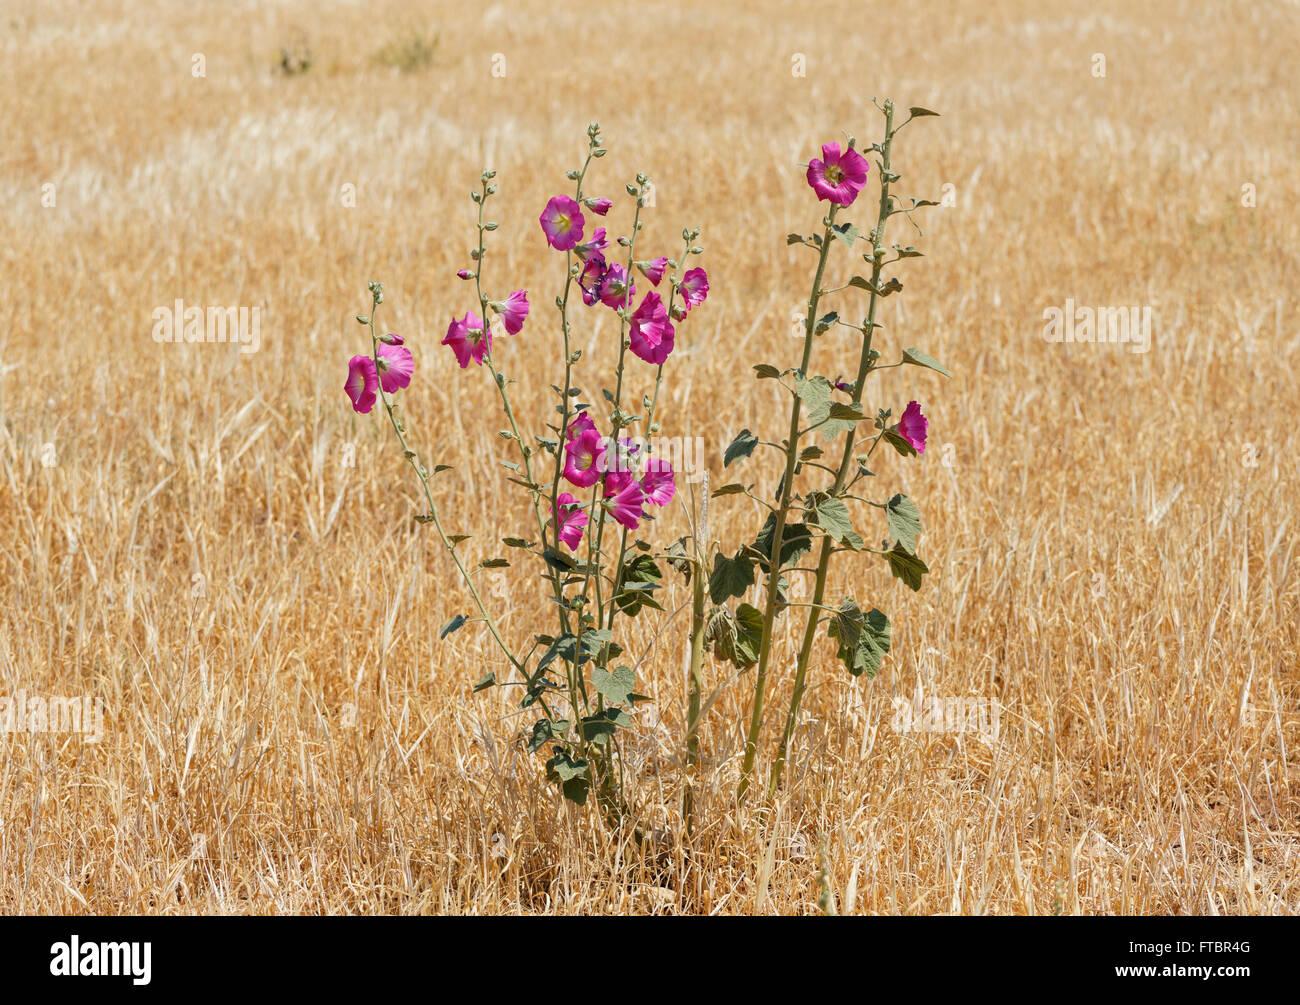 Biennial hollyhock (Alcea biennis), Anatolia, Turkey - Stock Image